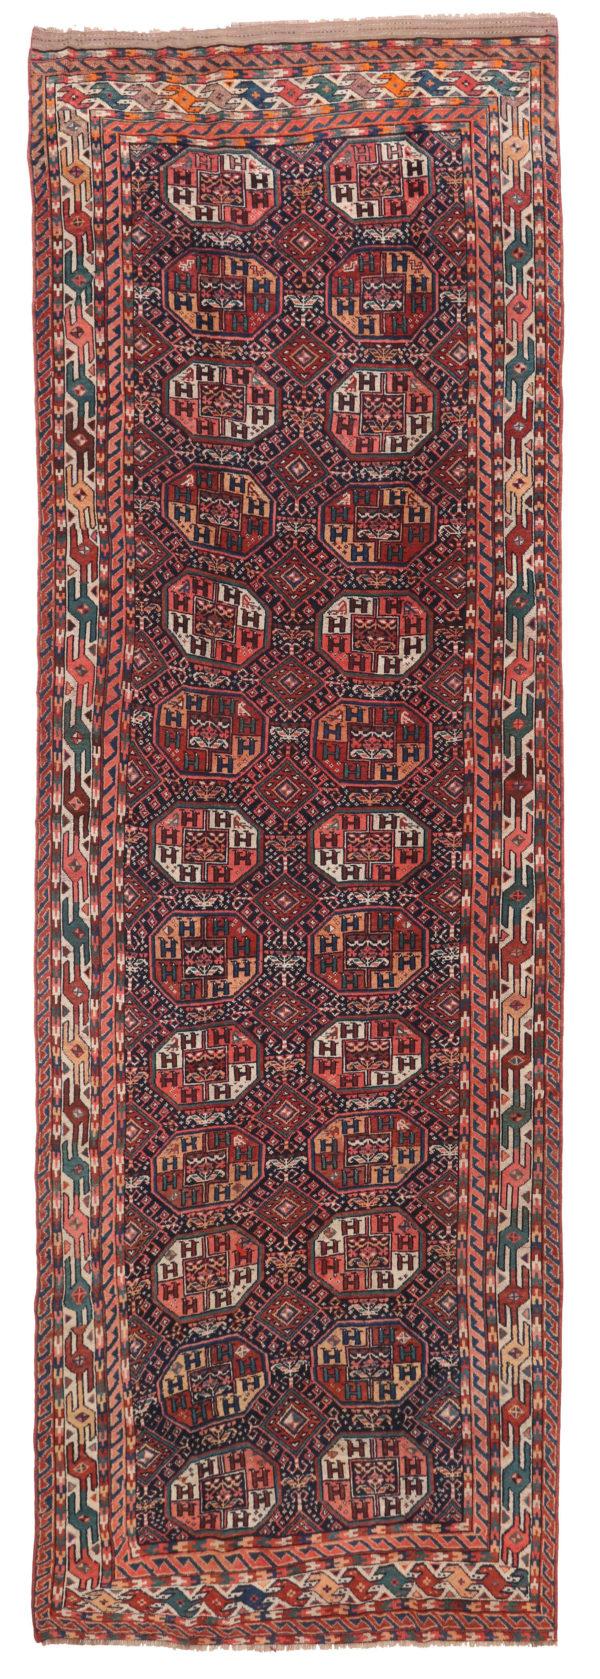 359175 Kurdi Gouchan Circa 1910 Slightly Low Pile Size 590 X 190 Cm 1 600x1679